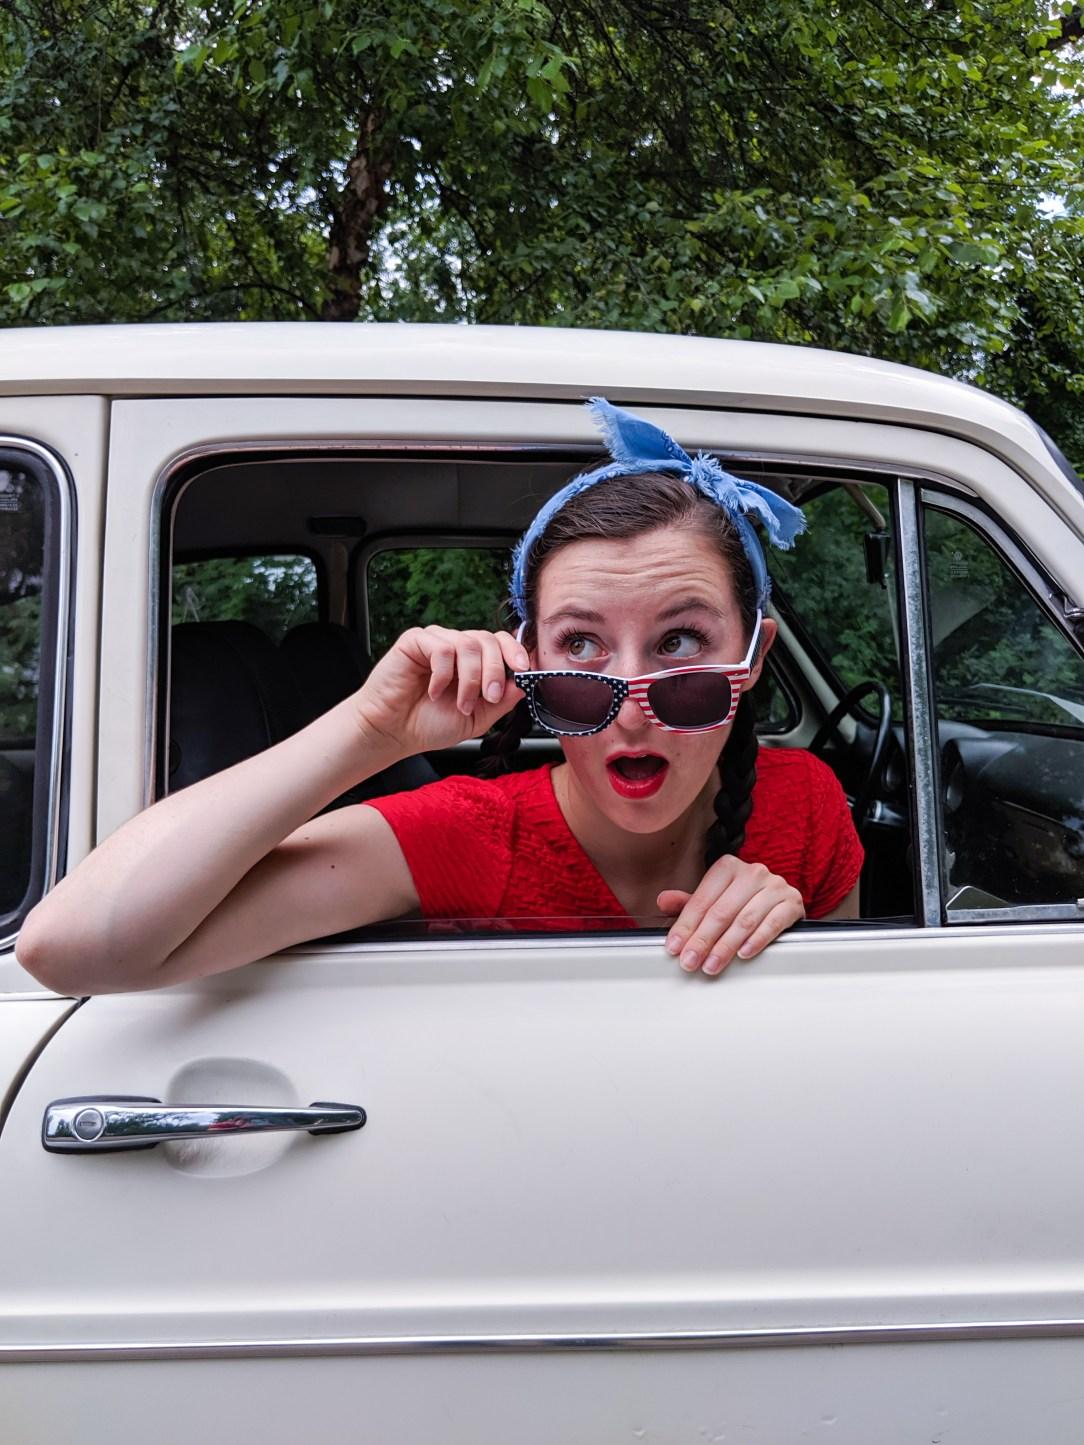 patriotic sunglasses, blue bandanna, old car, red lipstick